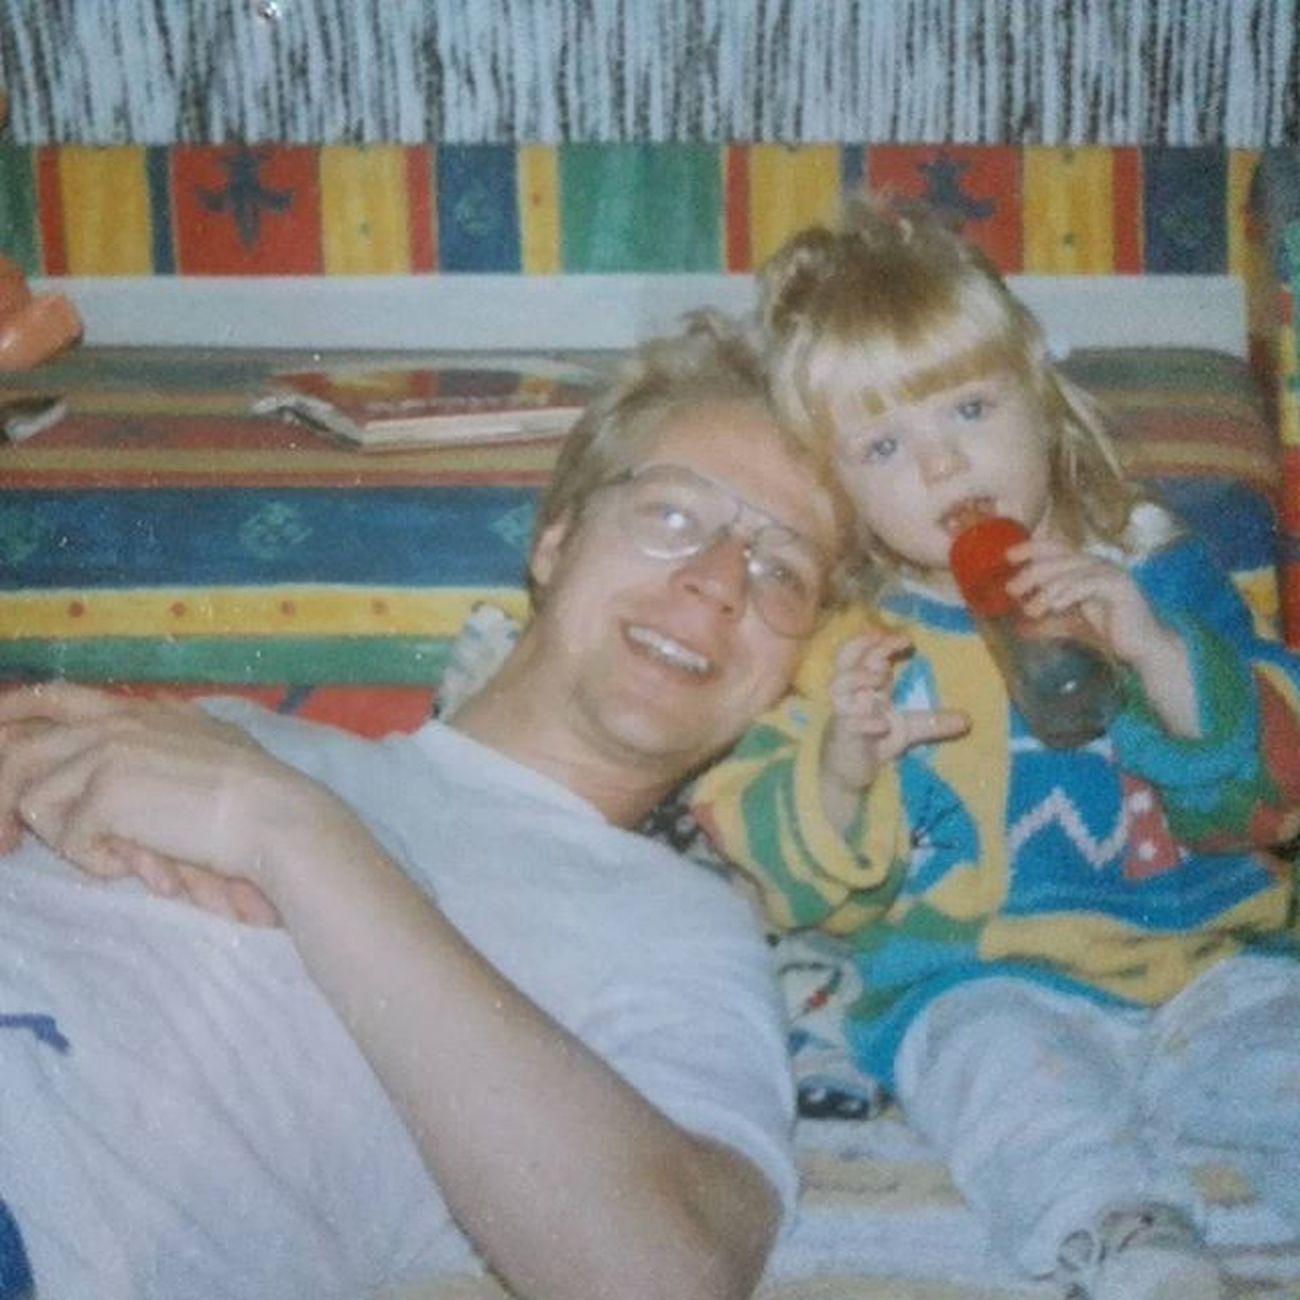 Apóca 💓 Oldpic Father Child Family Thuglife Blondes BlueEyes Apjalanya Mik Hungary Albino Szokesegek